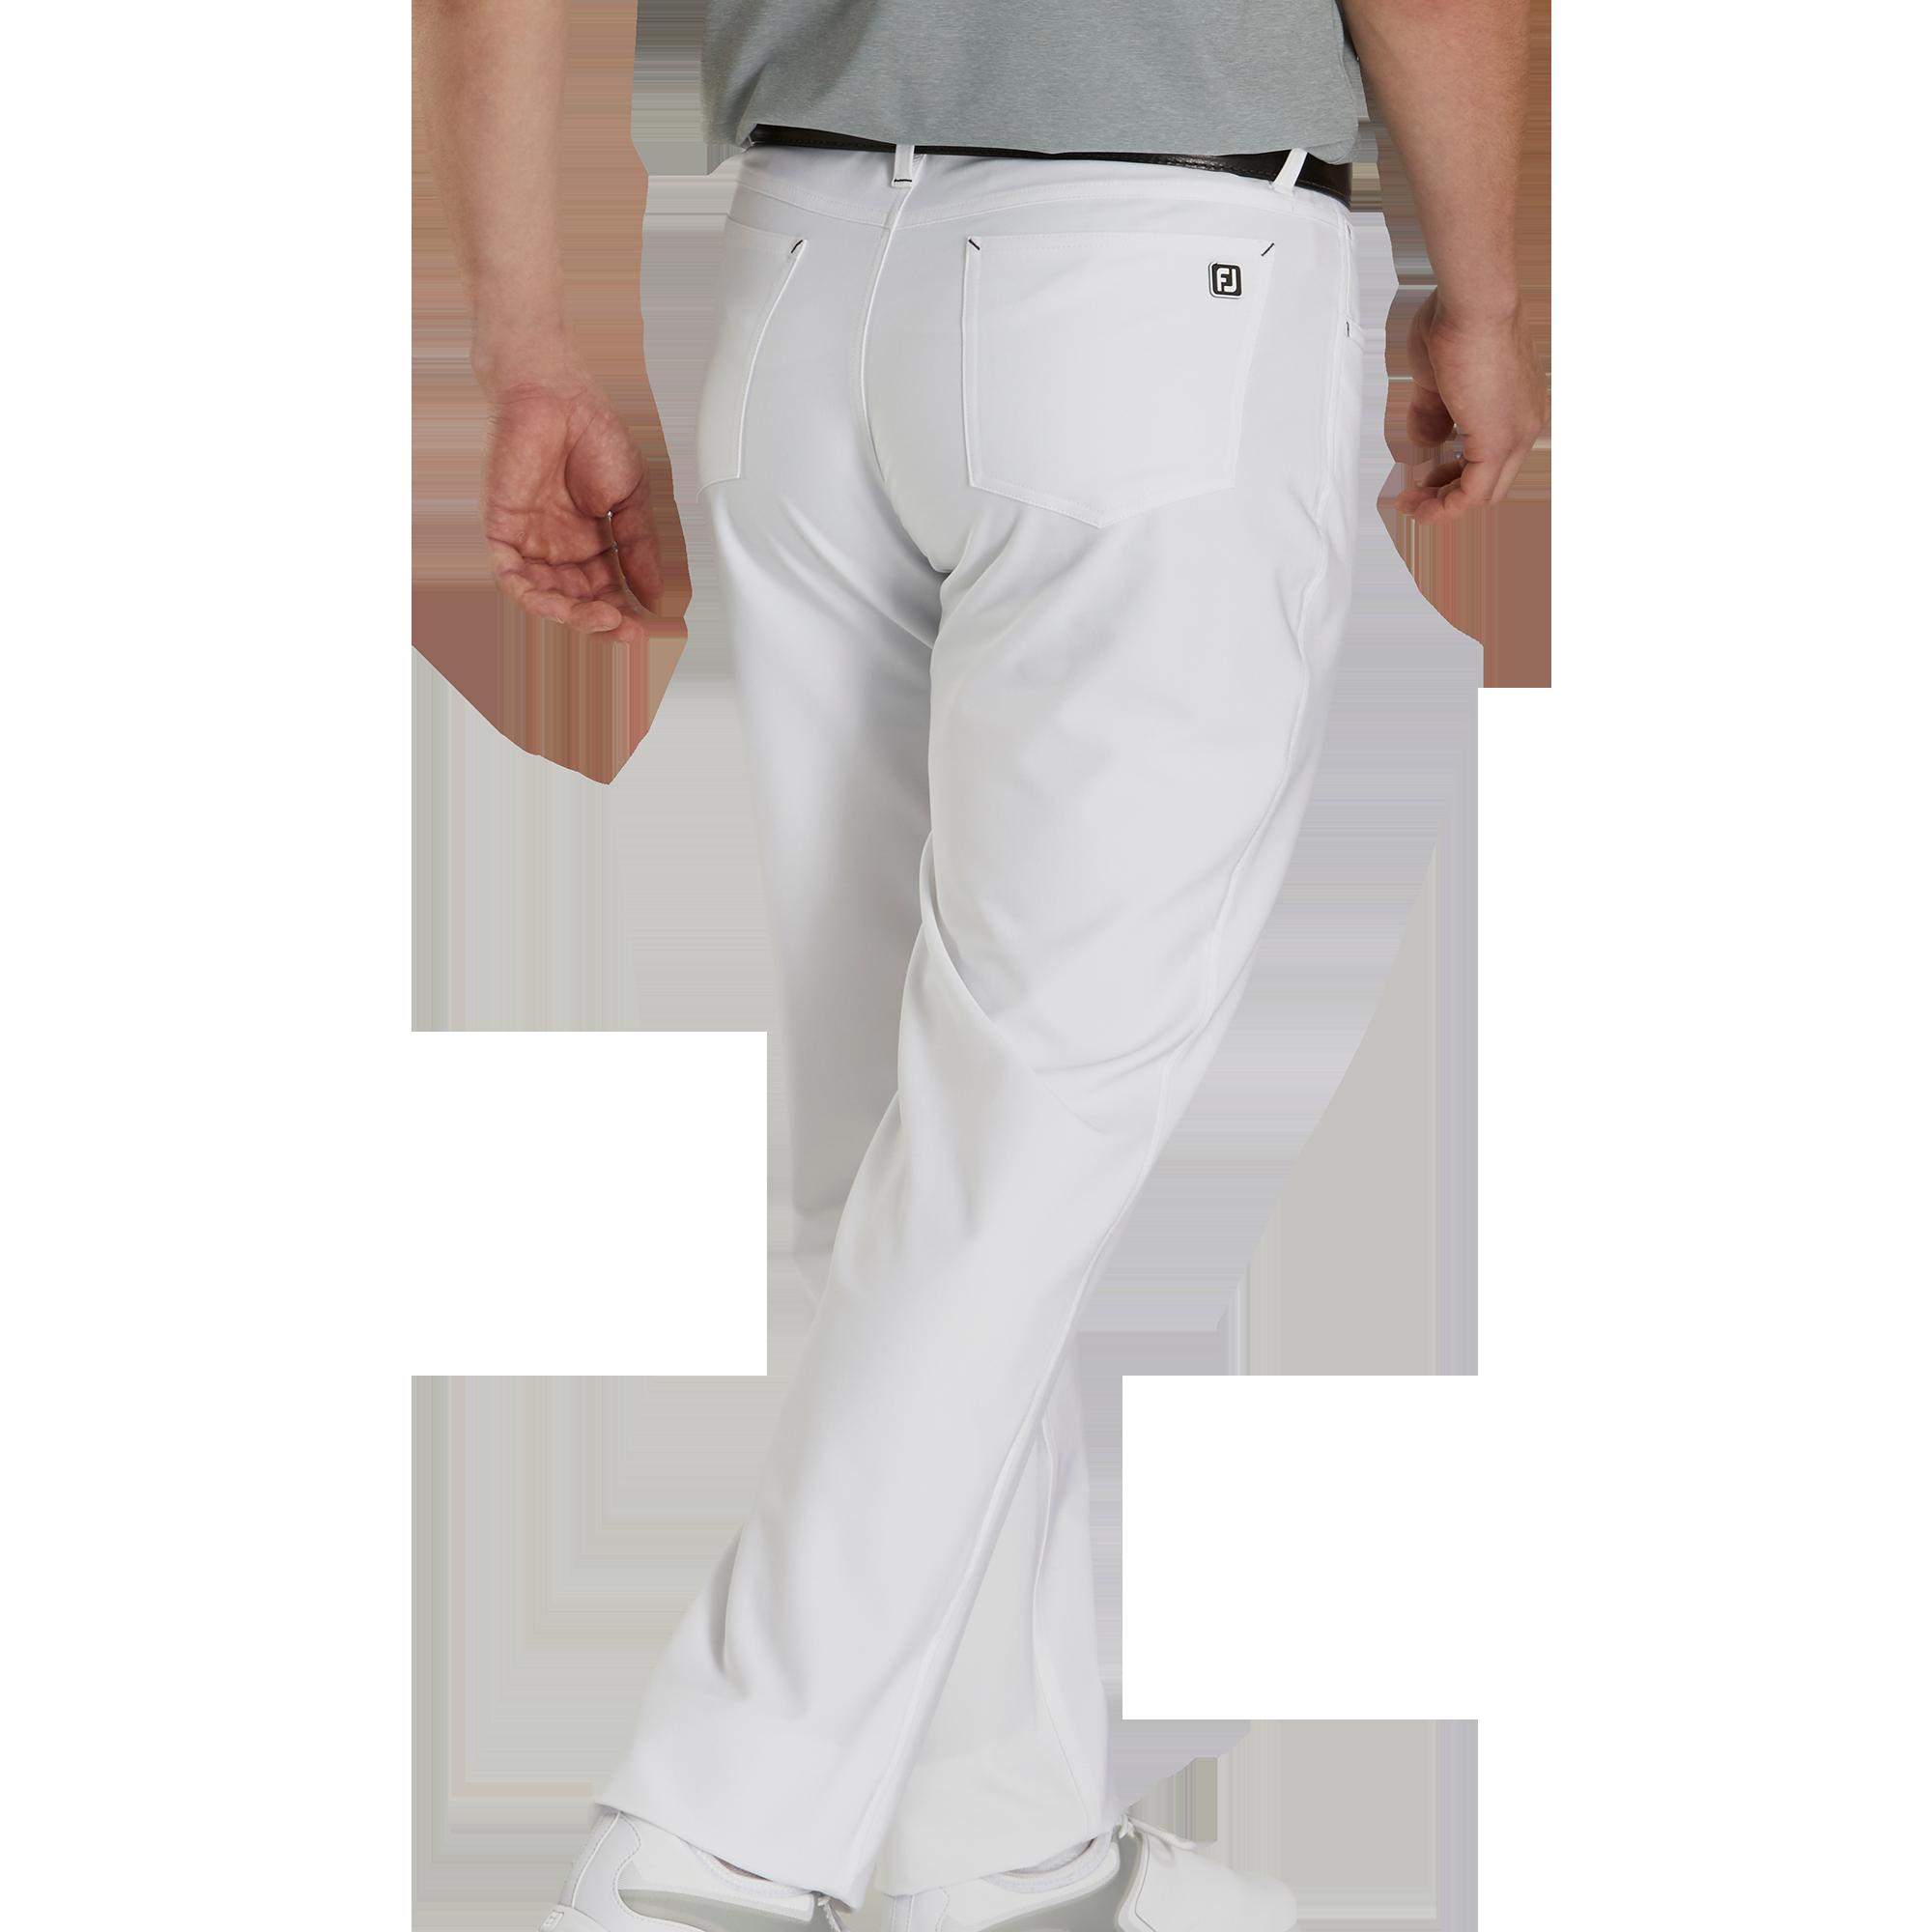 Golf Pants for Men at FootJoy